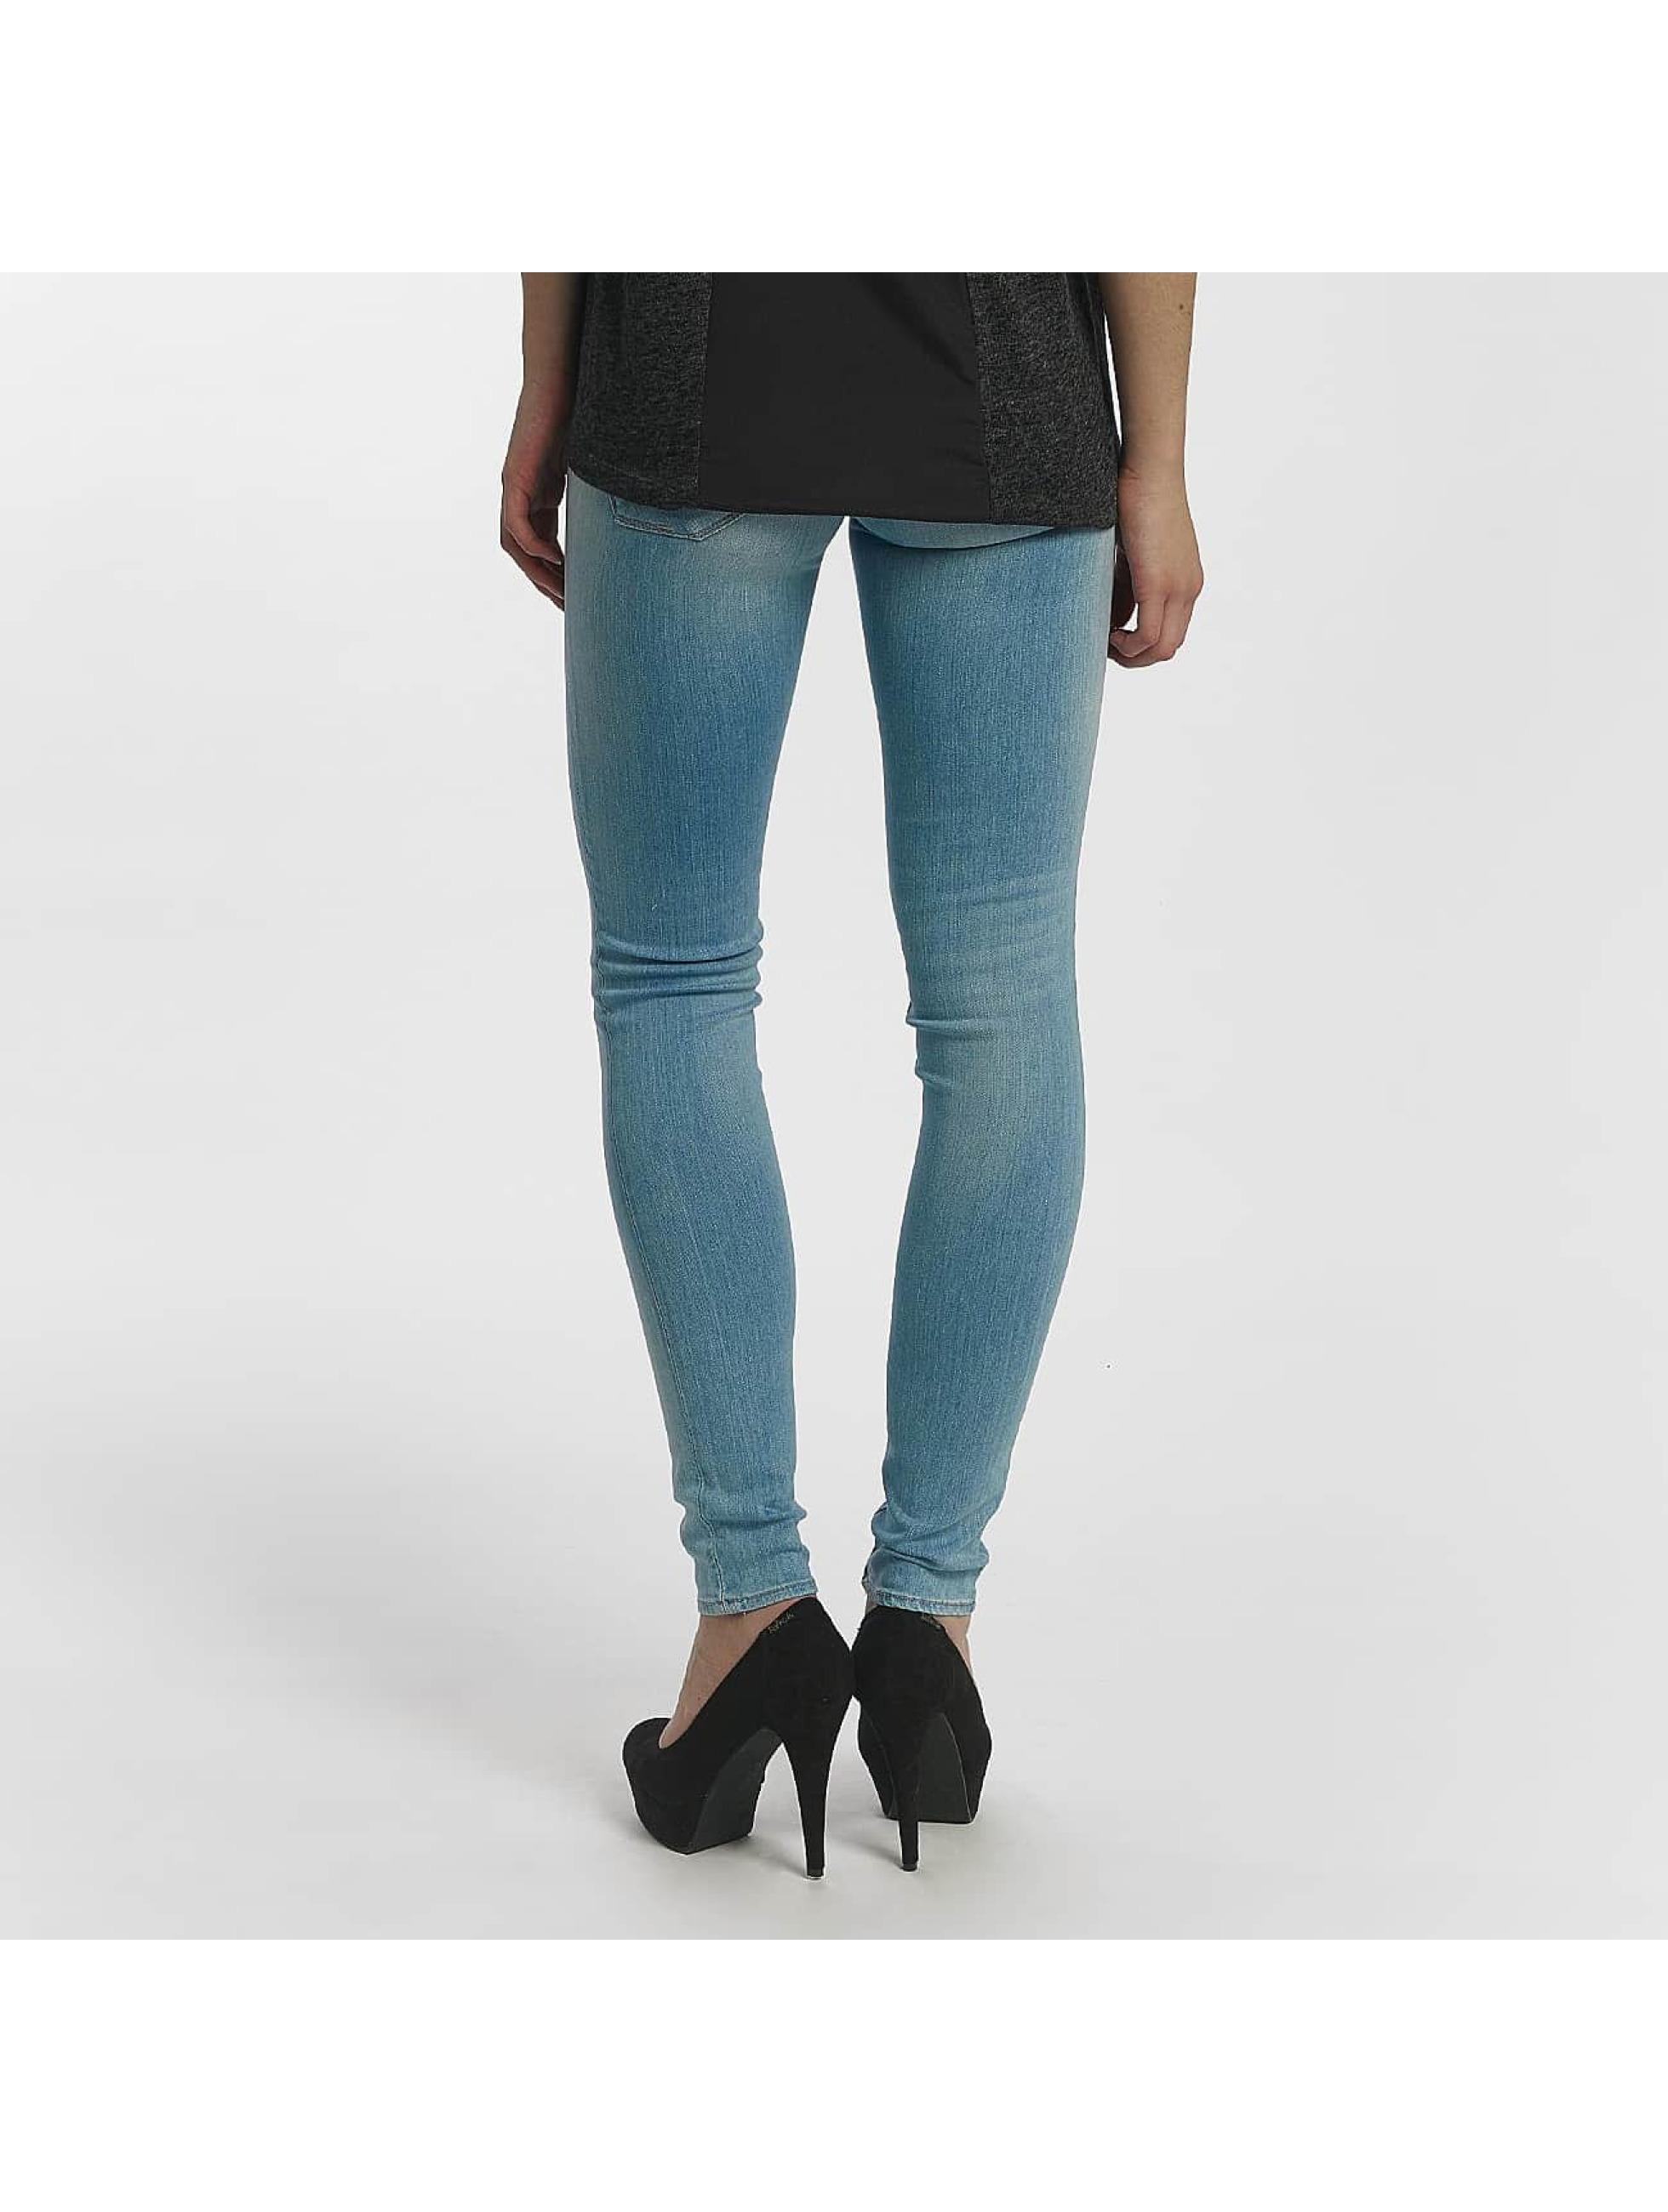 Le Temps Des Cerises Jeans ajustado Pulp azul